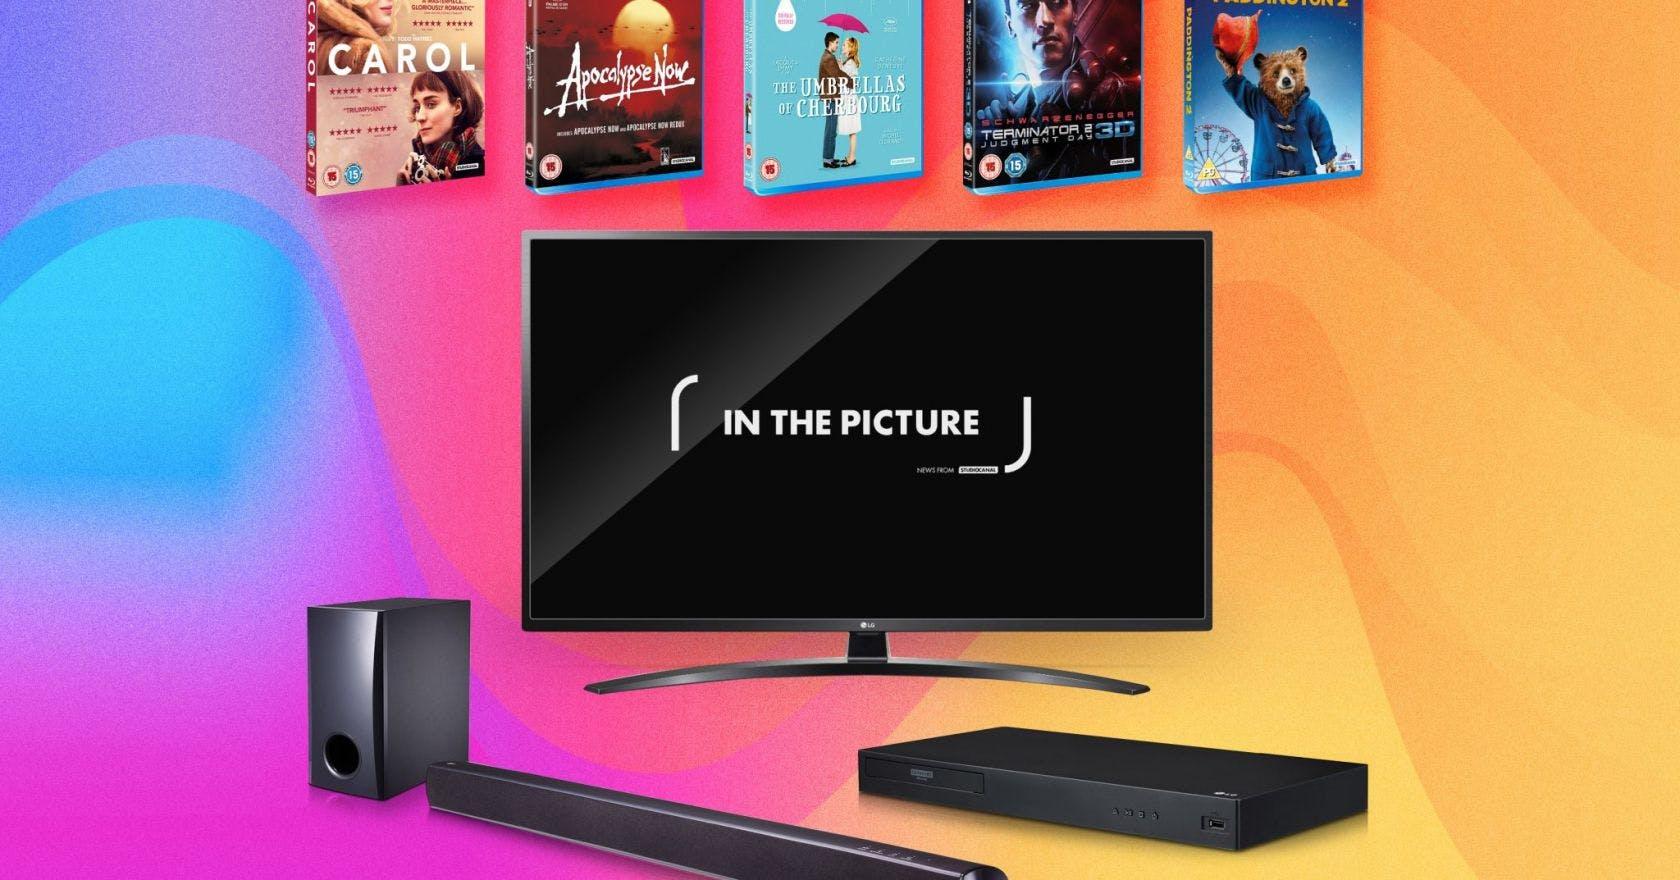 Win LG TV, Blu-ray player and soundbar plus iconic films